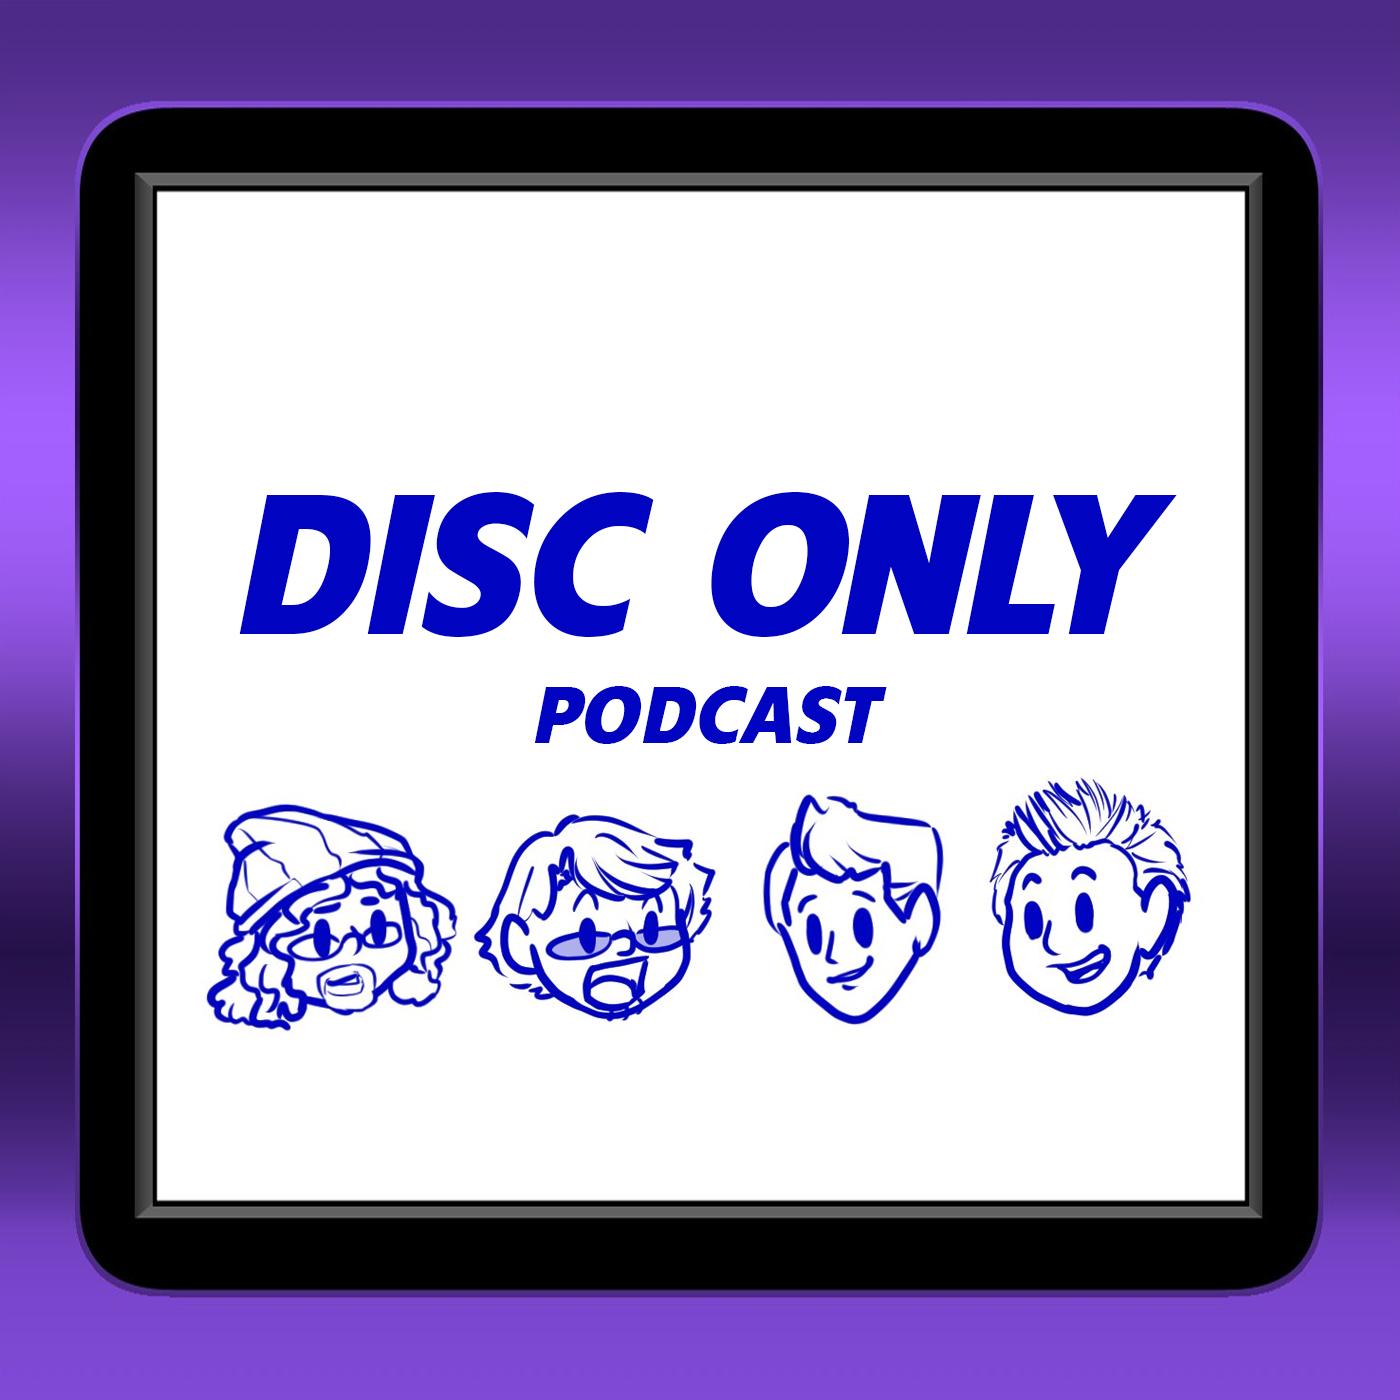 Disc Only show art